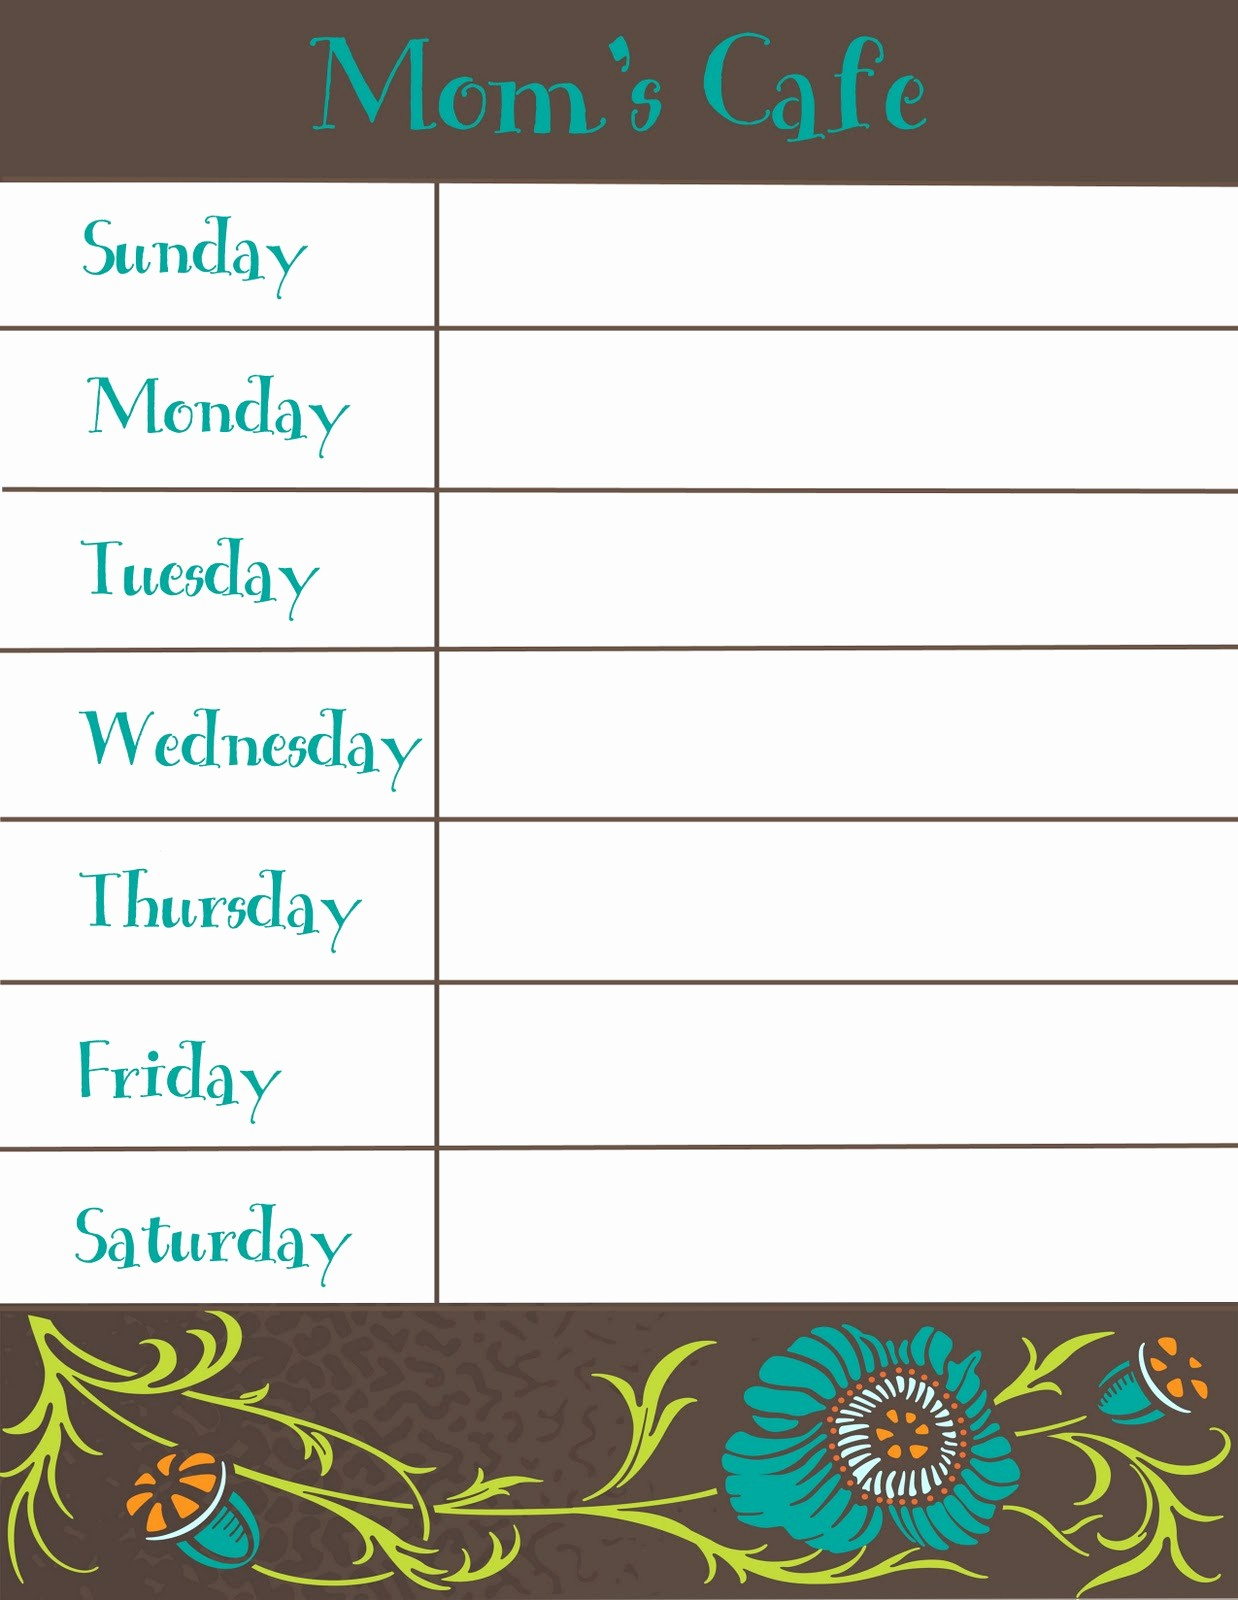 Free Printable Dinner Menu Templates New therapeutic Crafting Weekly Menu Printable